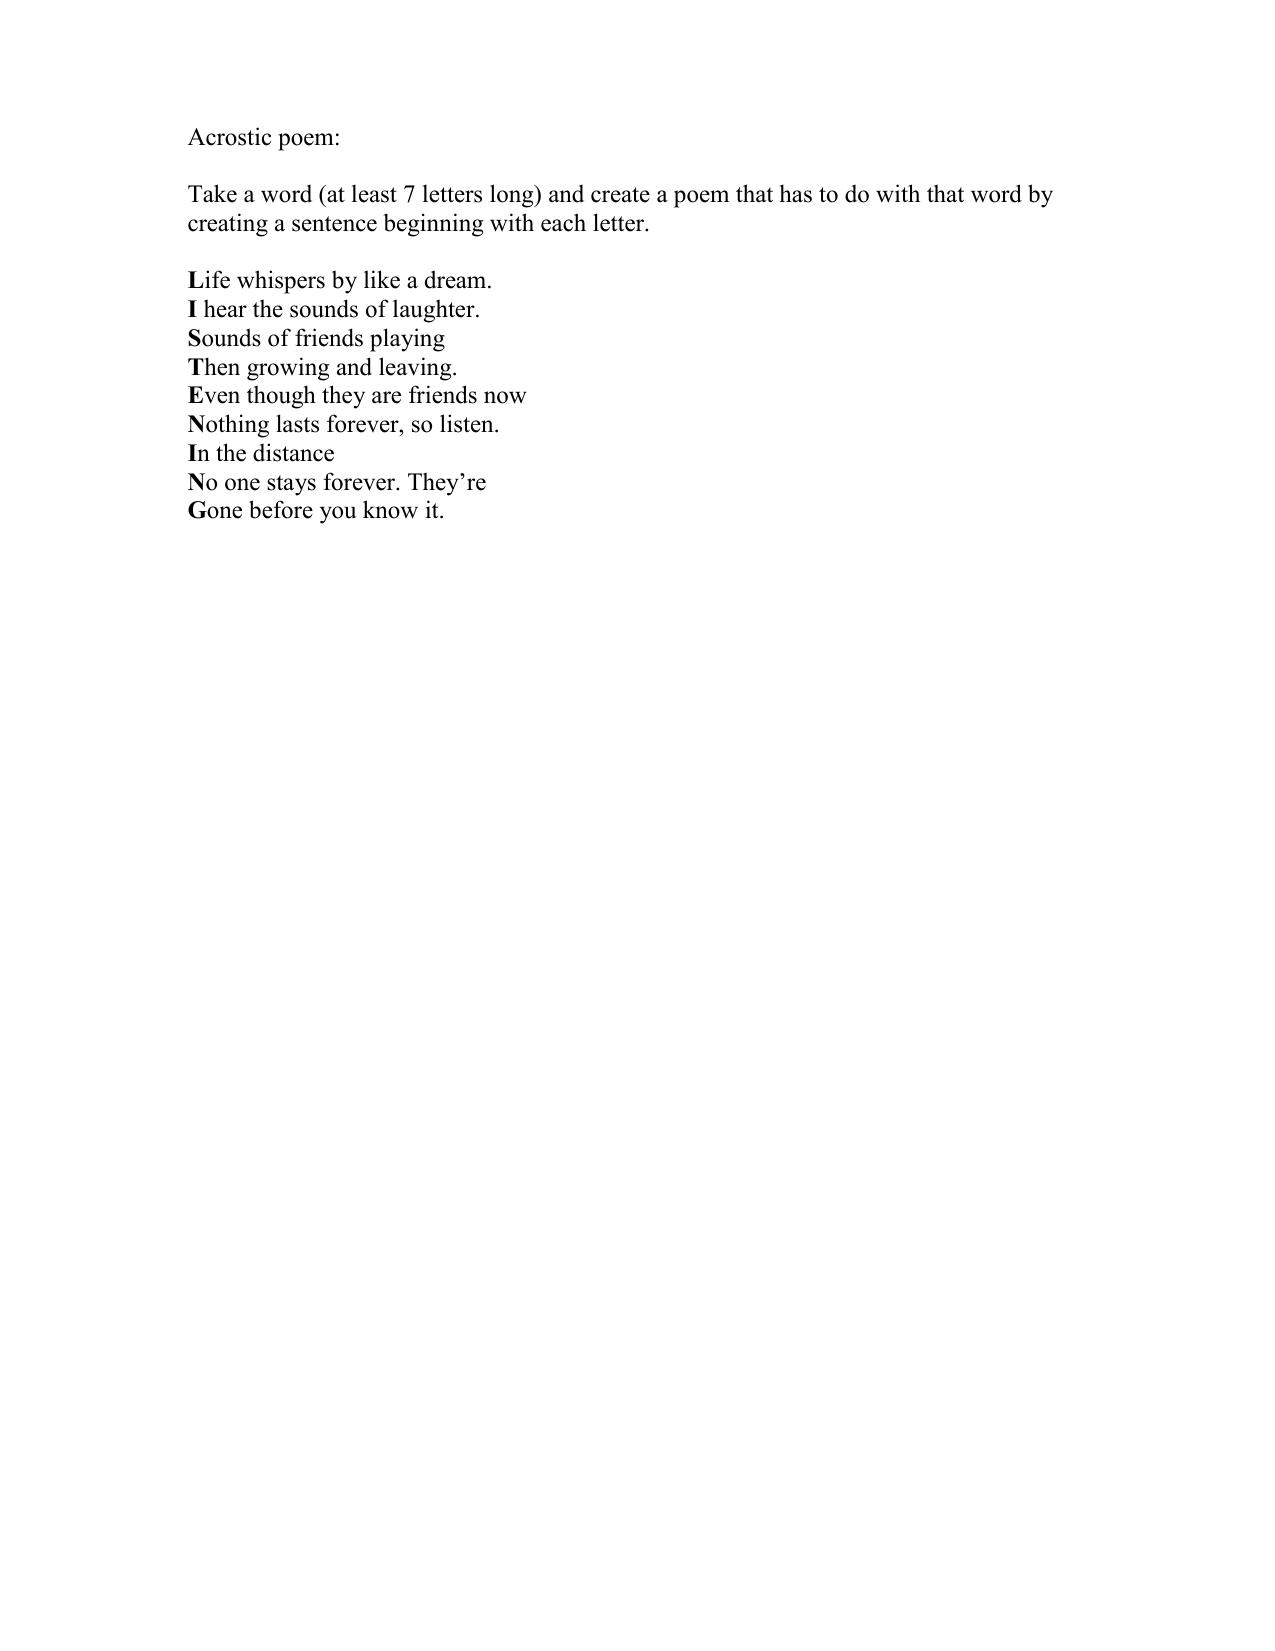 Acrostic poem - Peabody Elementary School